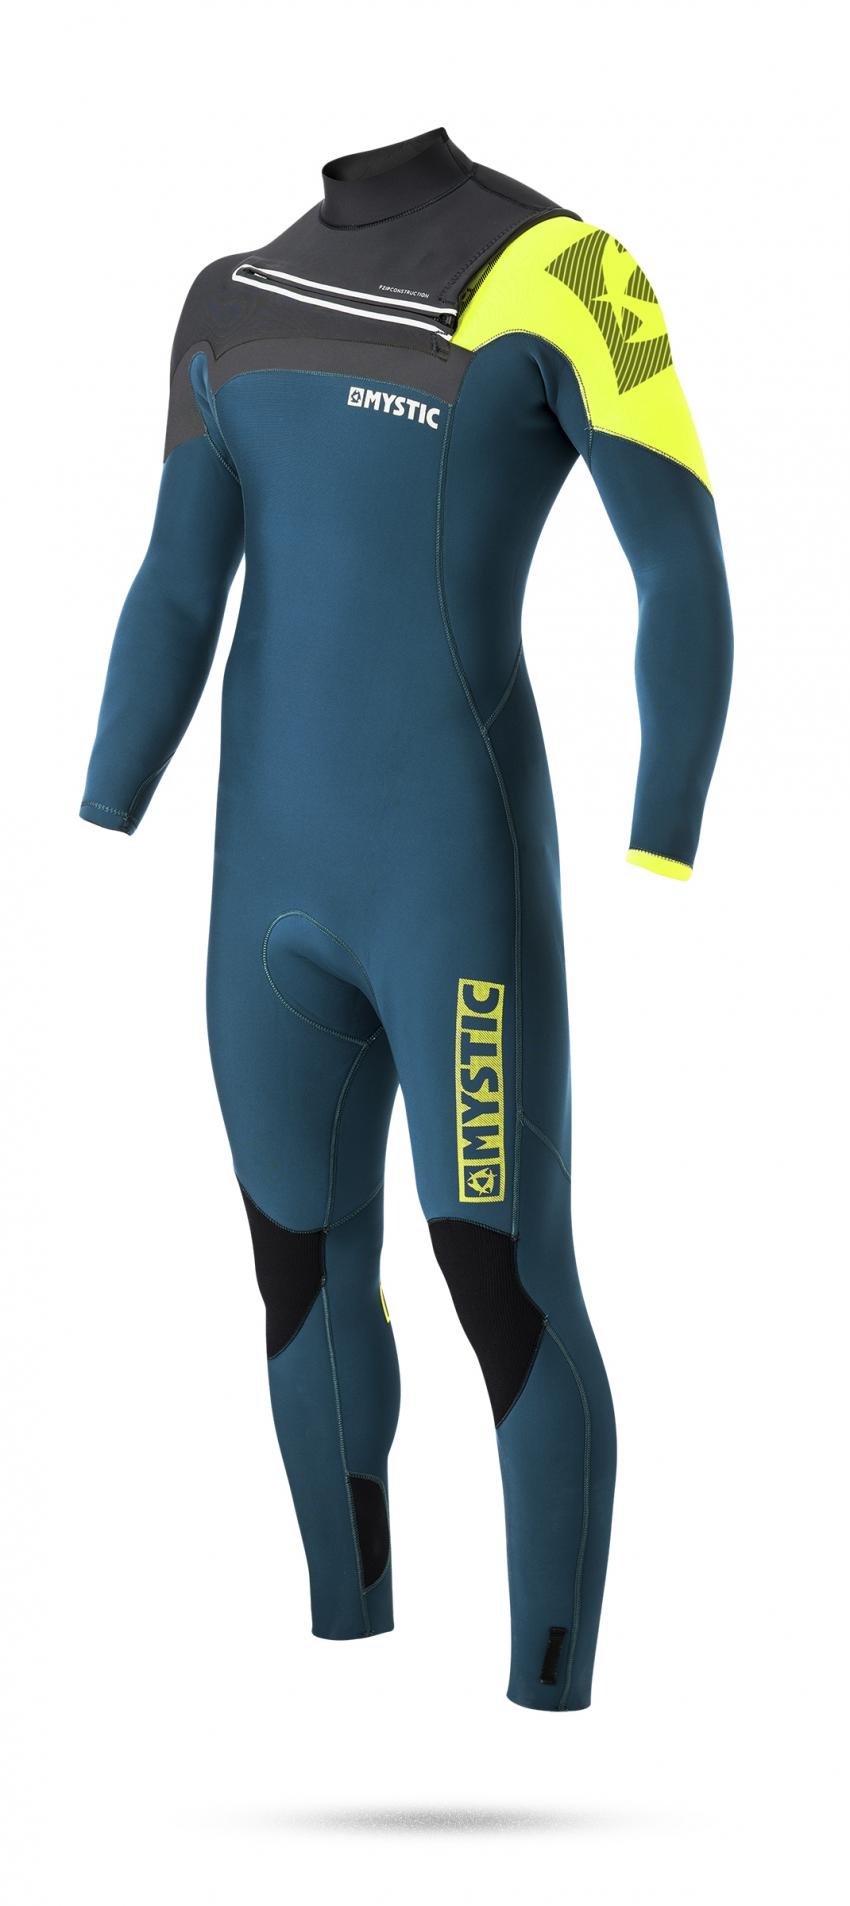 Neoprenový oblek Mystic Majestic 4/3 D/L Fullsuit Frontzip, Lime L